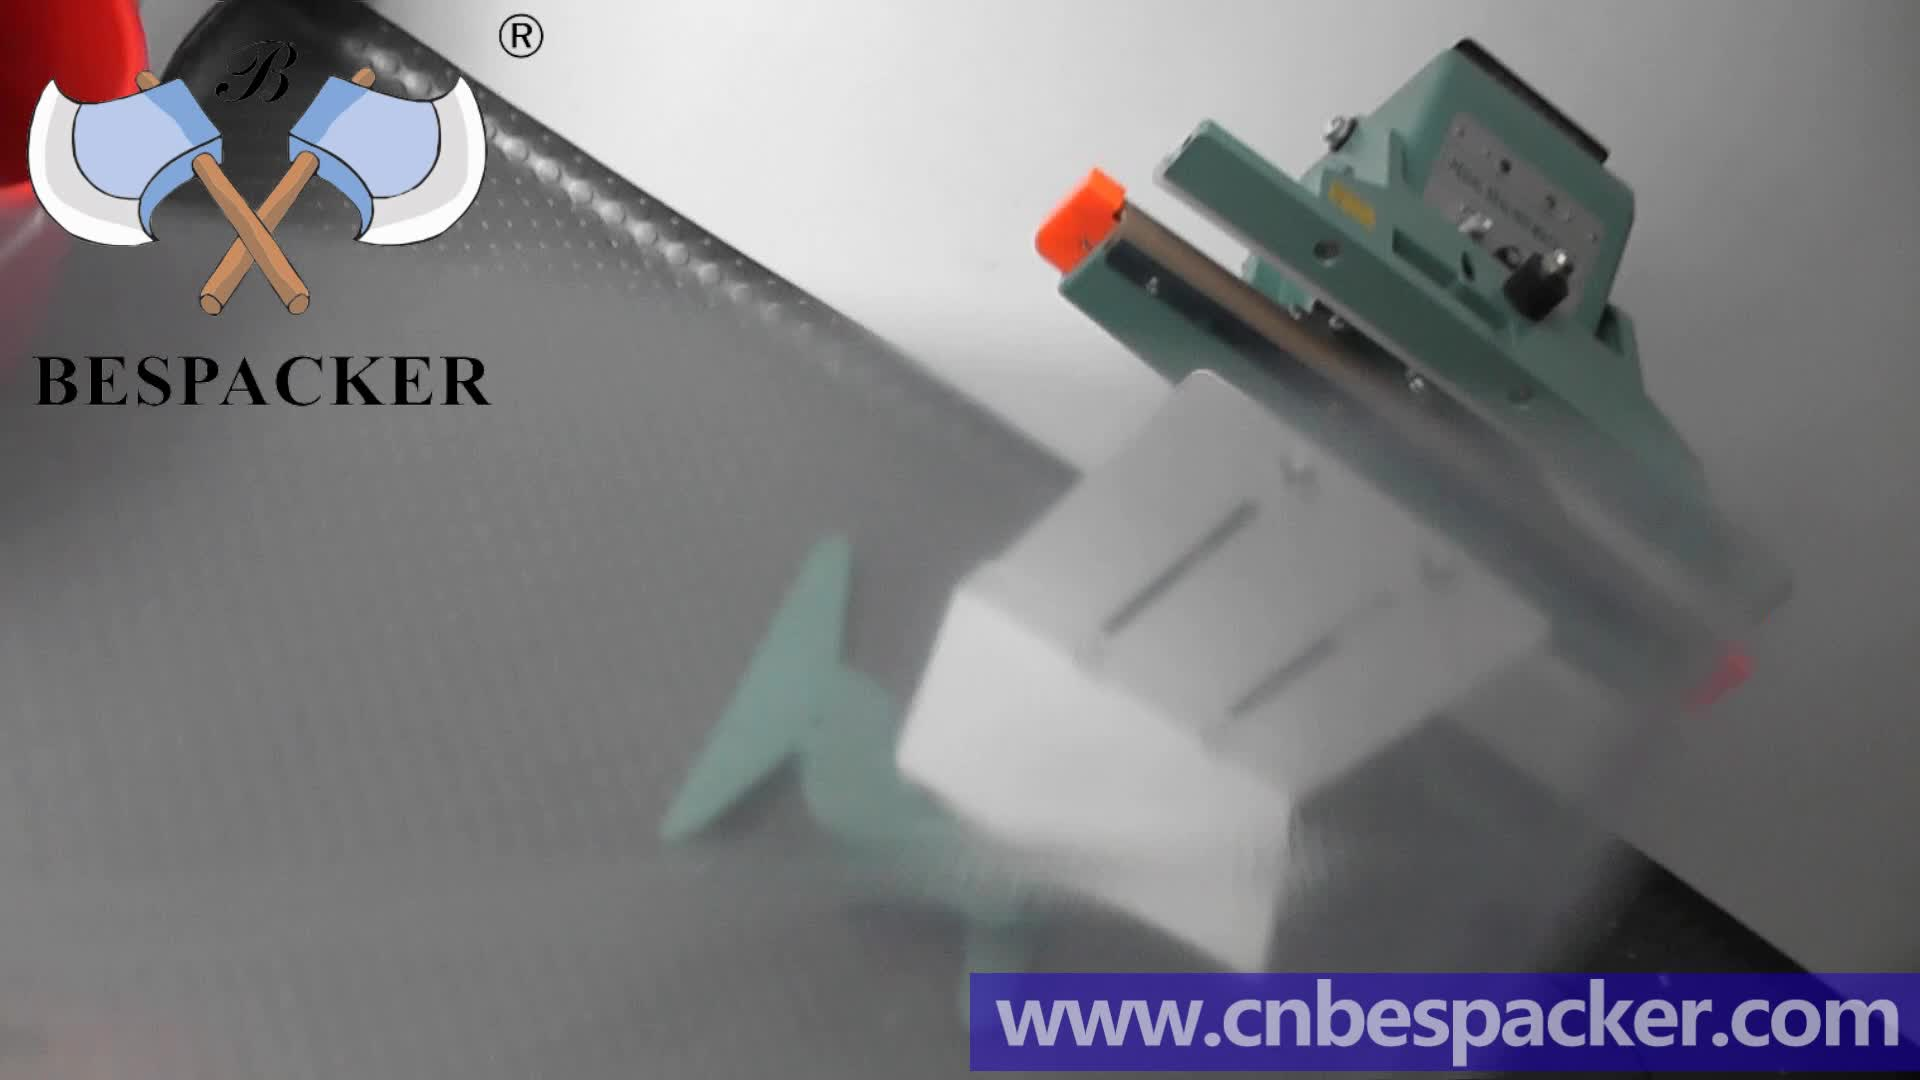 Bespacker PFS-350 Double seals type aluminum body foot sealer sealing machine for plastic bag